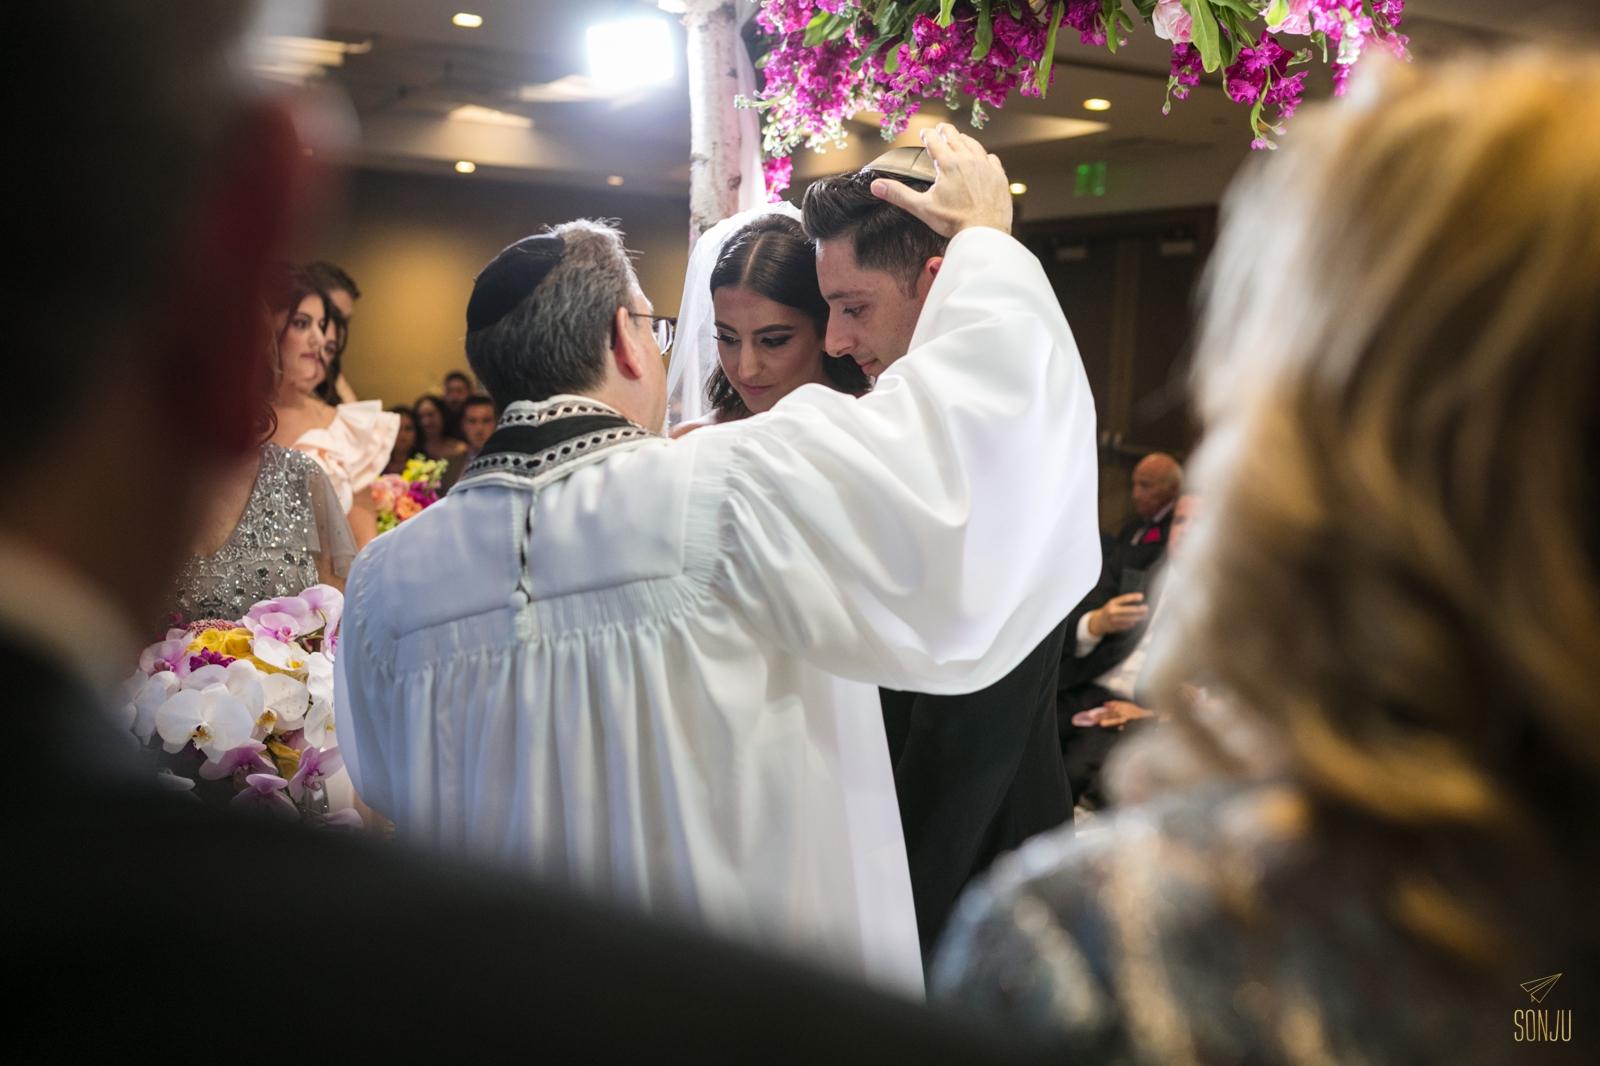 South-Florida-wedding-photographer-jewish-ceremony-chuppah